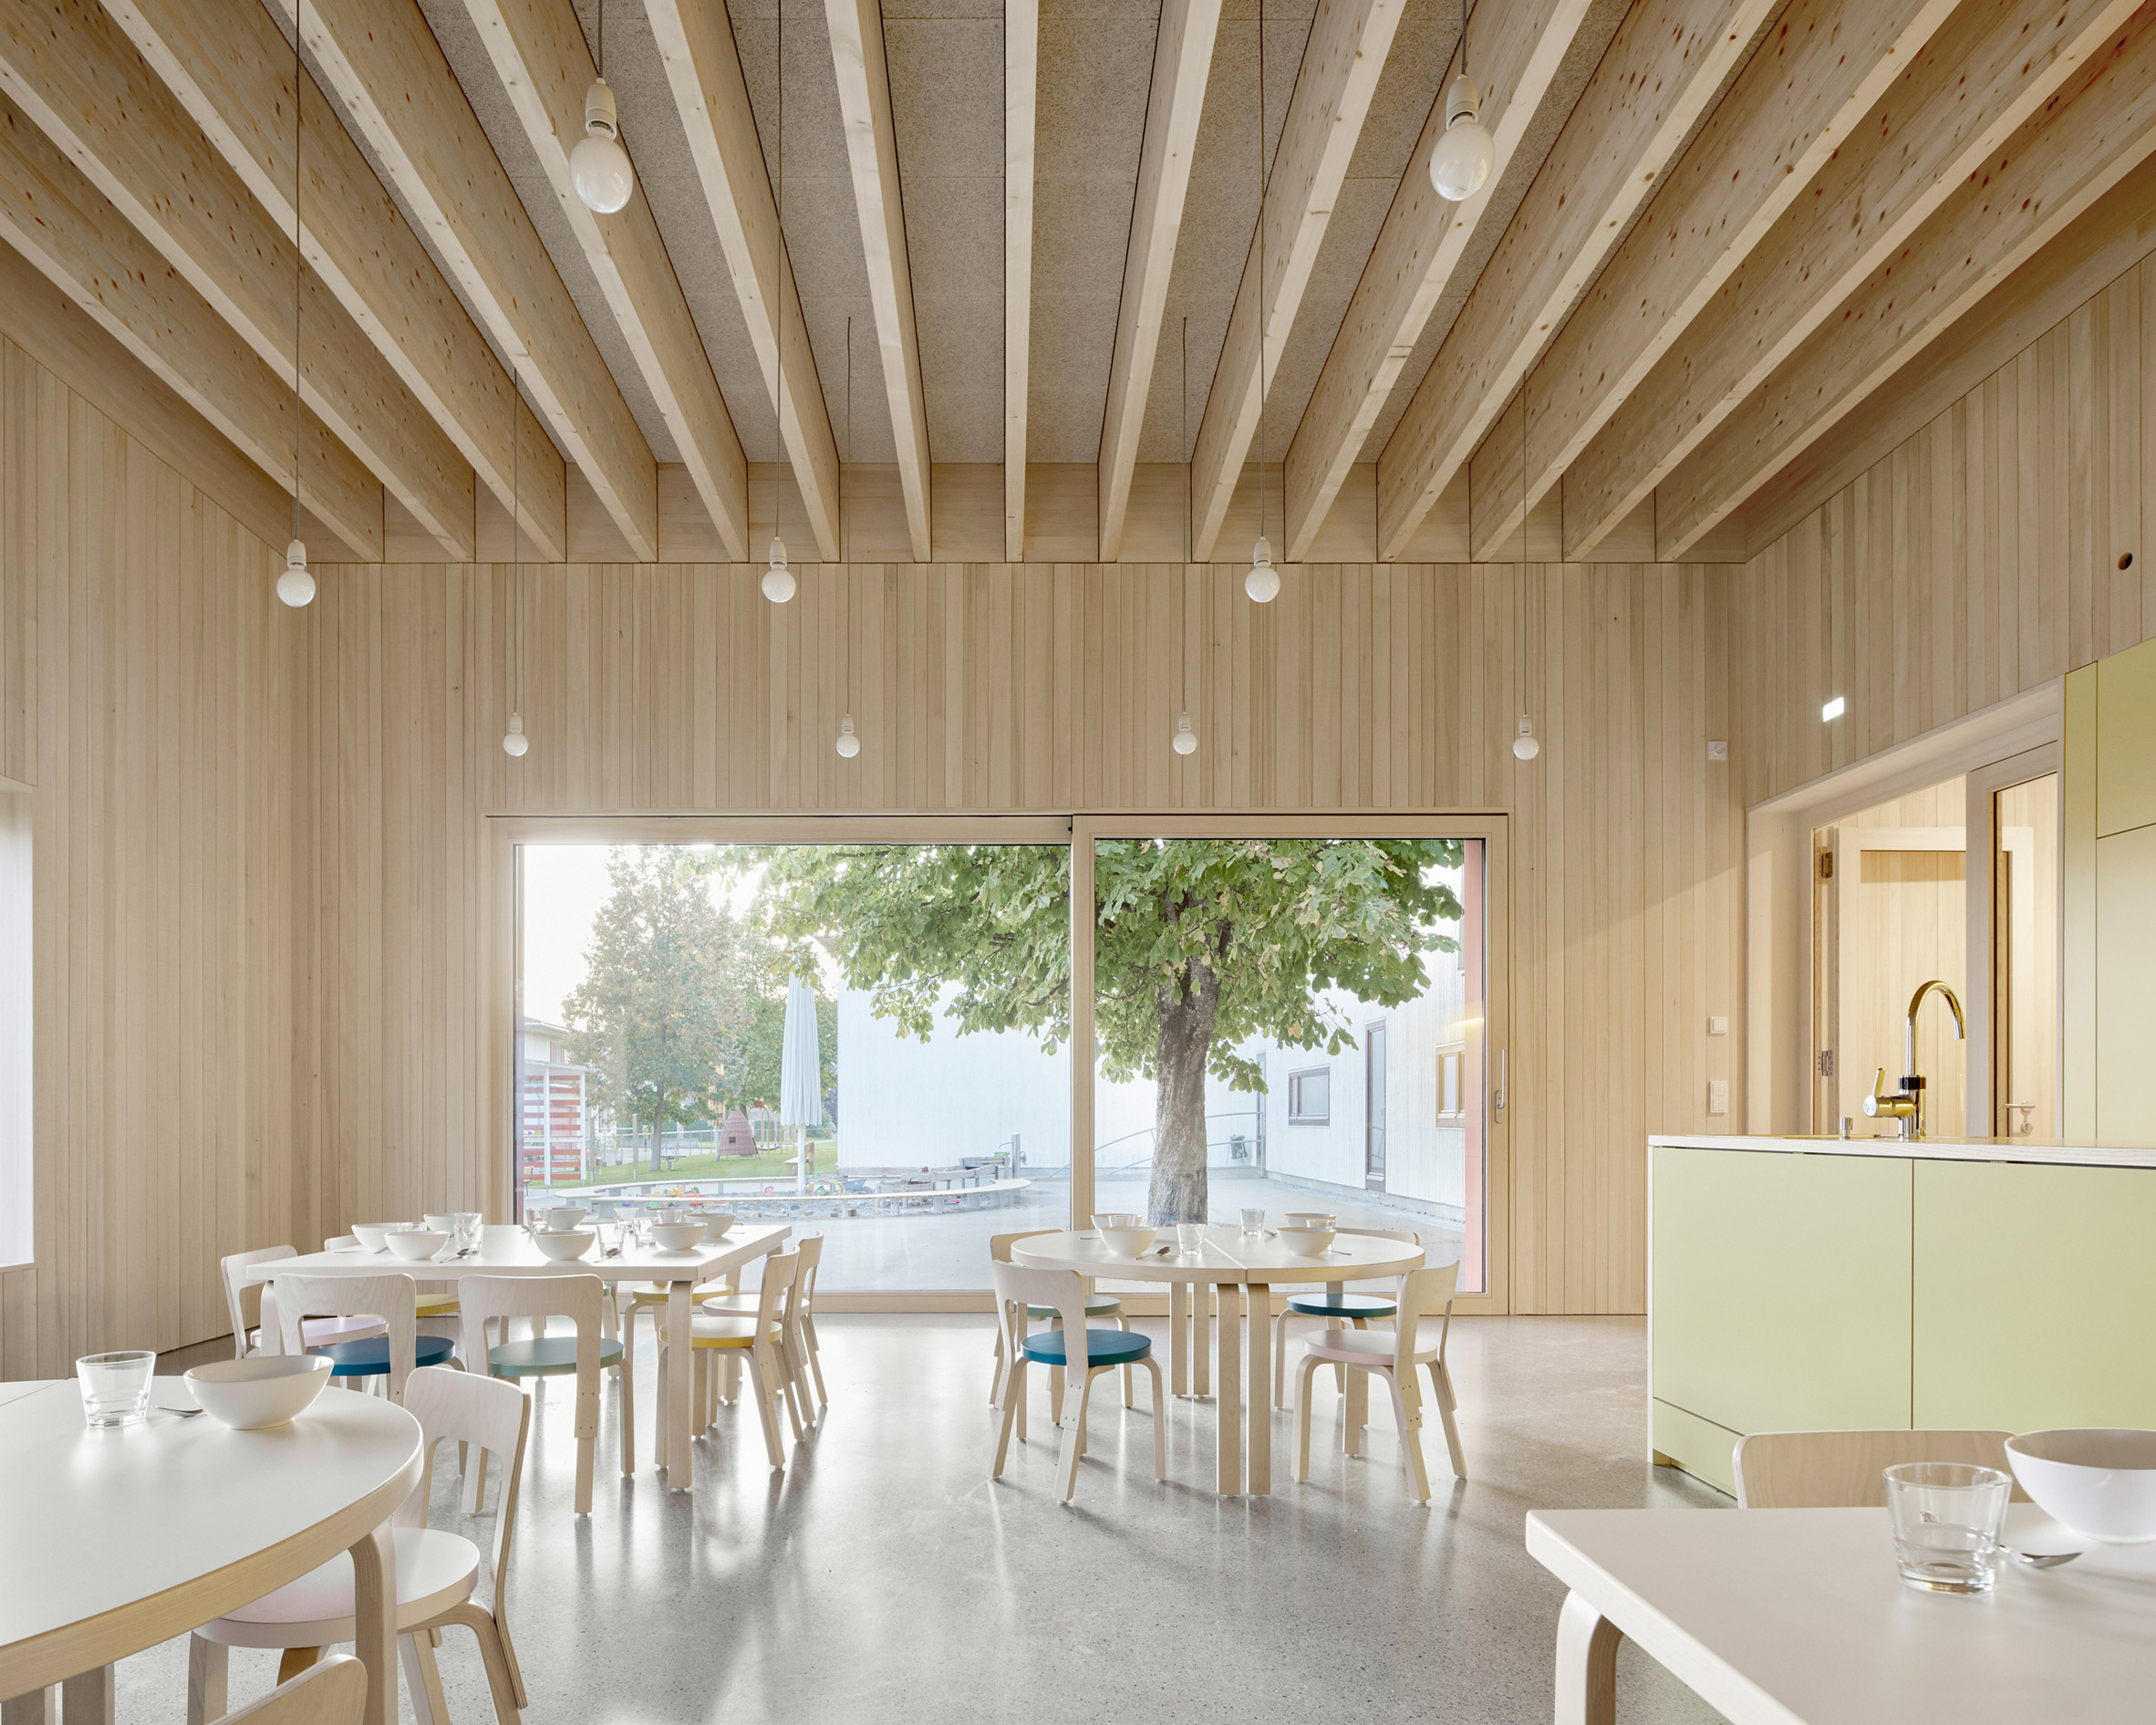 Timber dining room inside the kindergarten